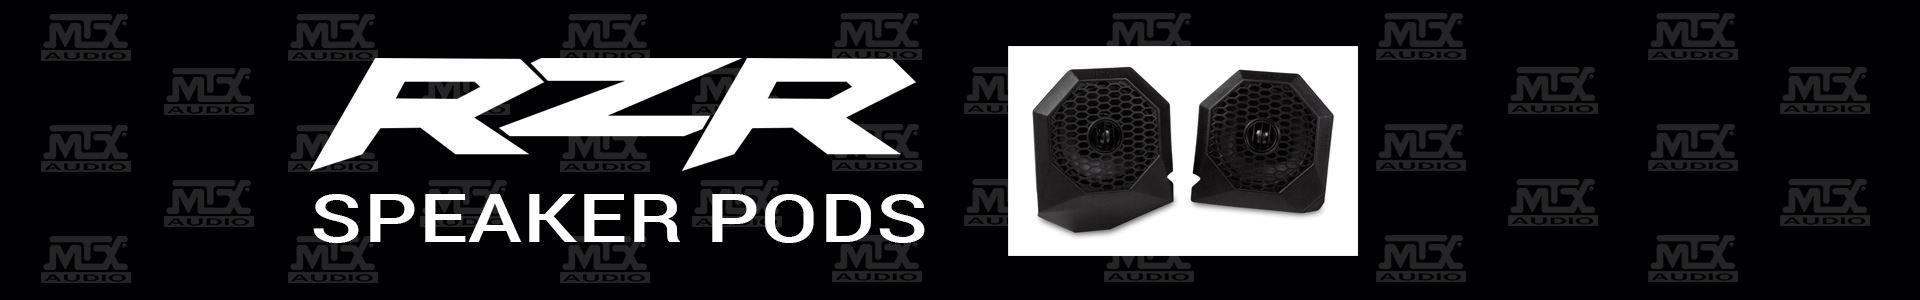 MTX Releases Polaris RZR Specific Speaker Pods